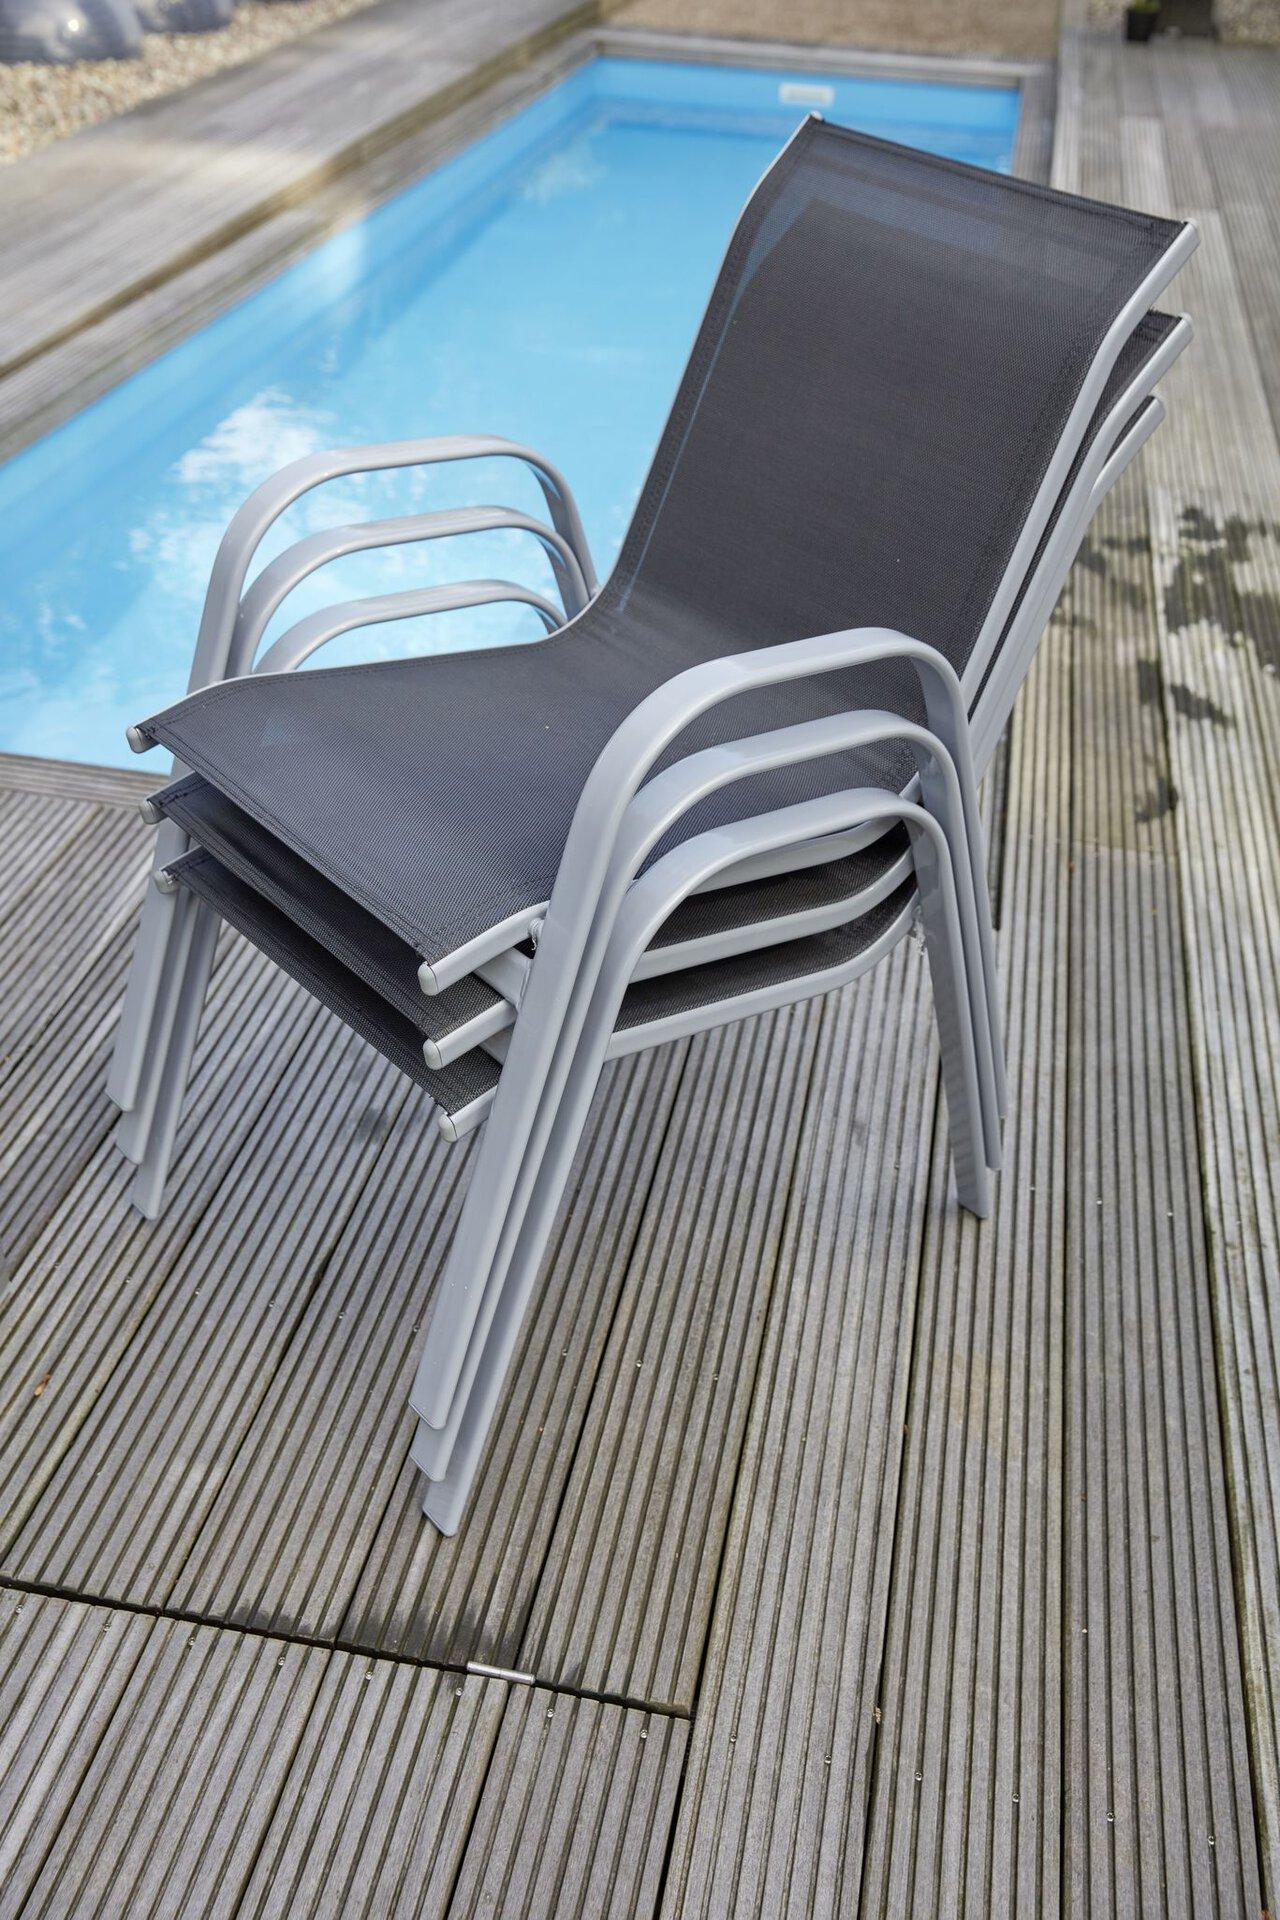 Stapelstuhl TRIXI Outdoor Textil schwarz 50 x 90 x 70 cm